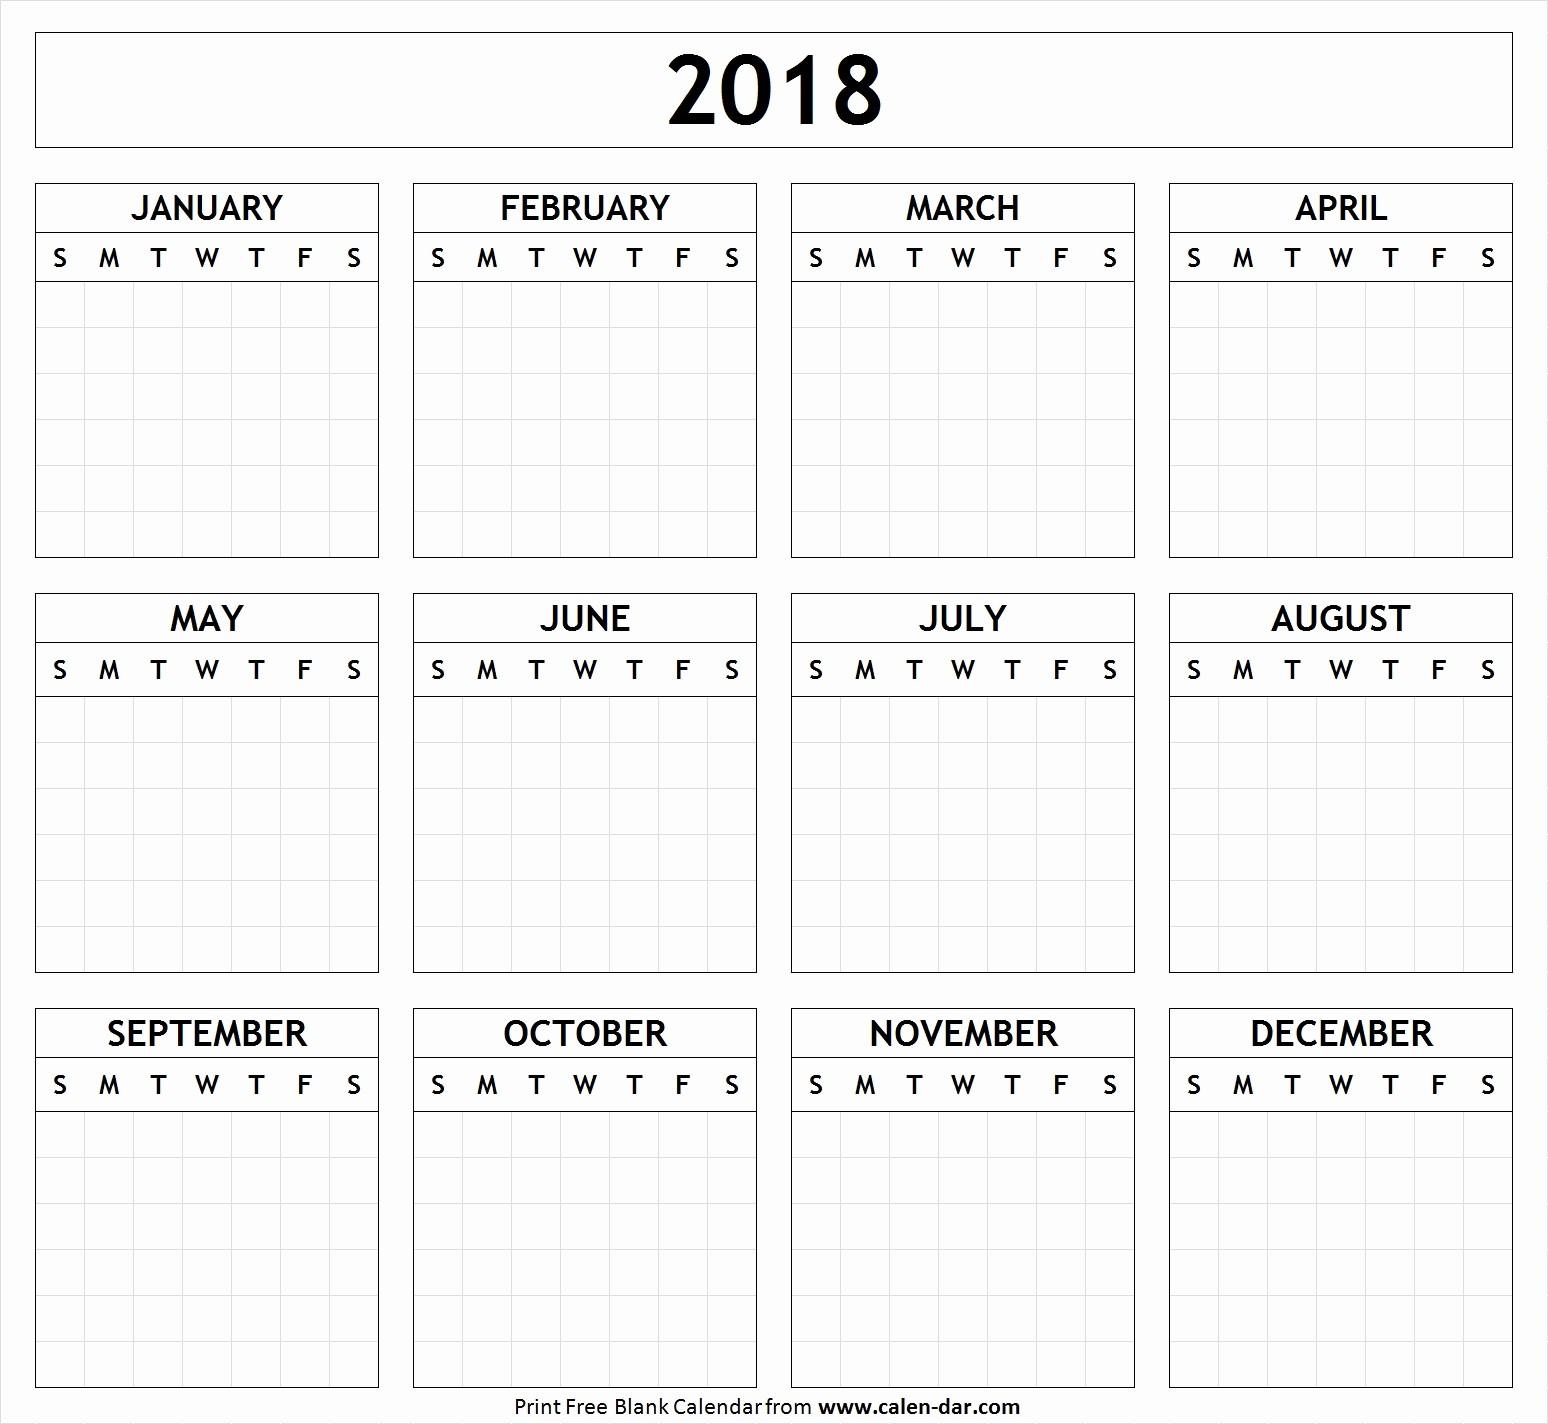 Free Printable Yearly Calendar 2018 Elegant Printable Quarterly Calendar 2018 Printable 360 Degree